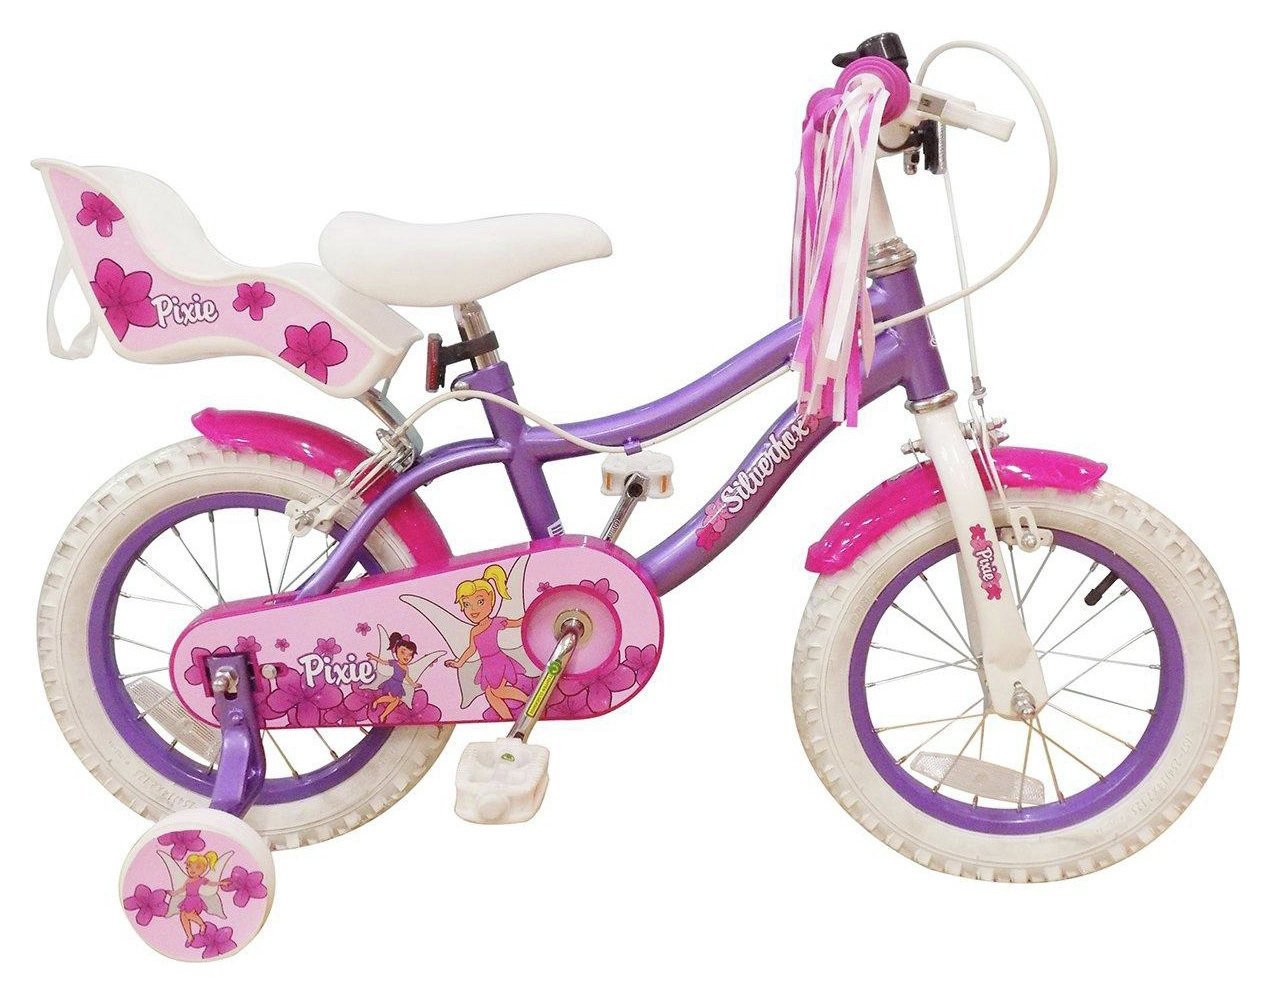 Silverfox Pixie 14 Inch Kids Bike